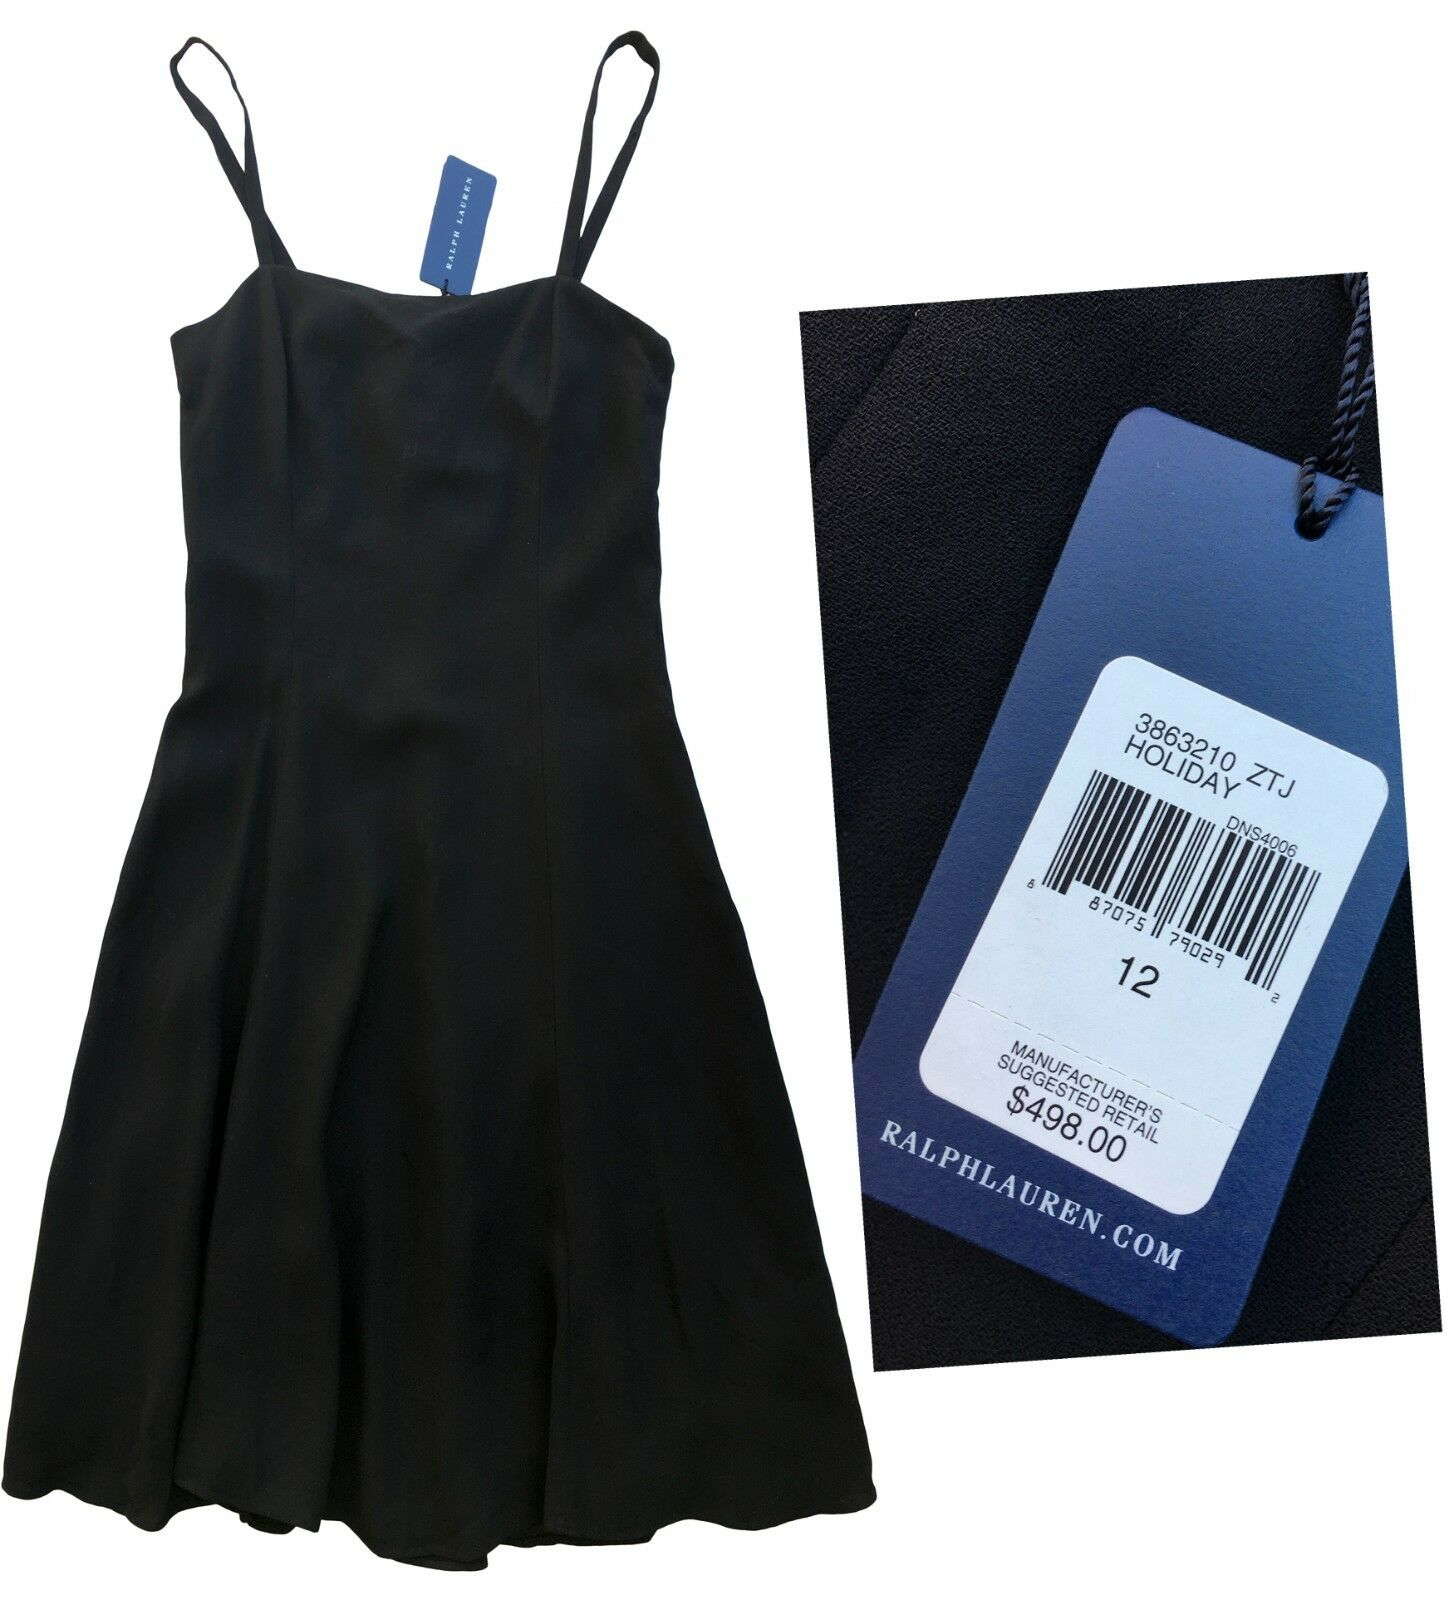 498 Ralph Lauren azul Label ella Negro Doble crepe de lana viscosa LBD Vestido 12  genuina alta calidad